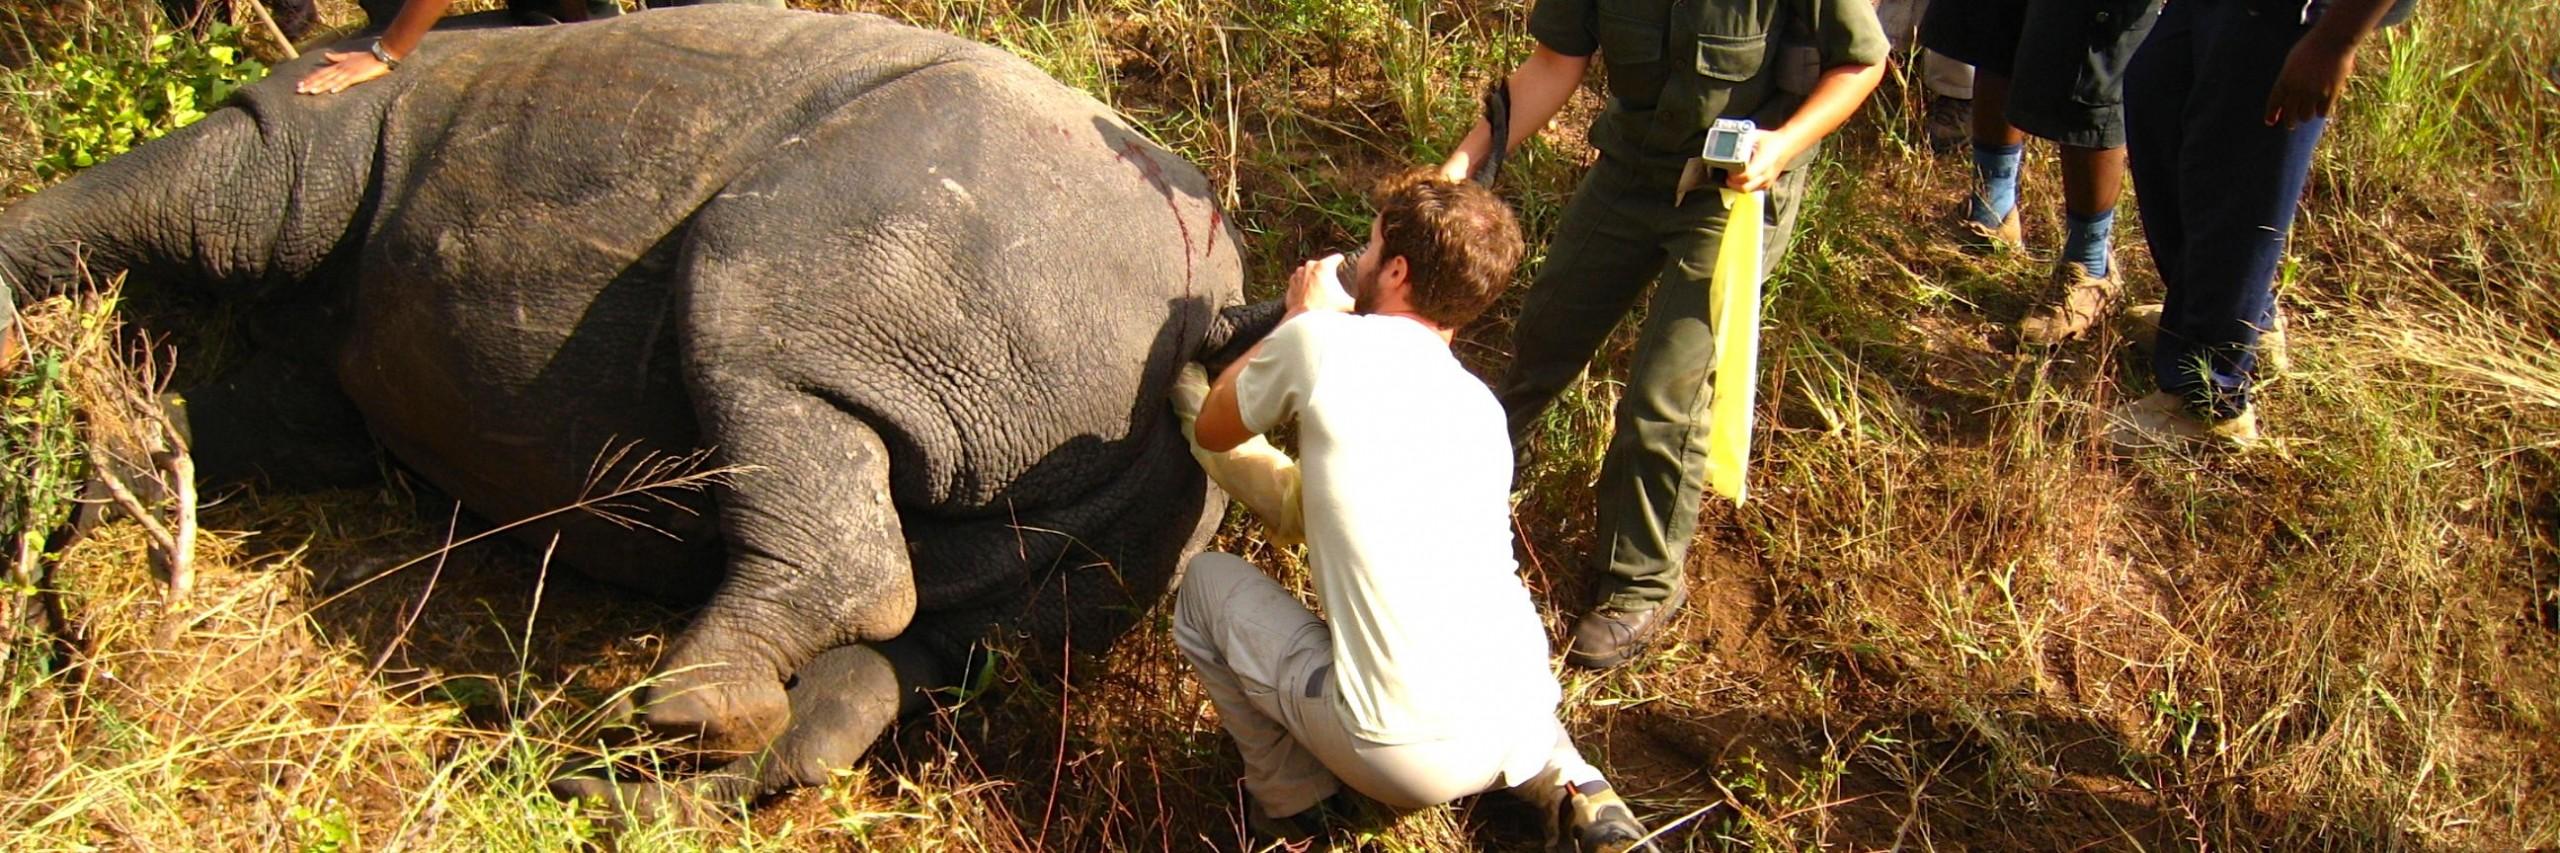 Elliott Garber Palpating Rhino in South Africa